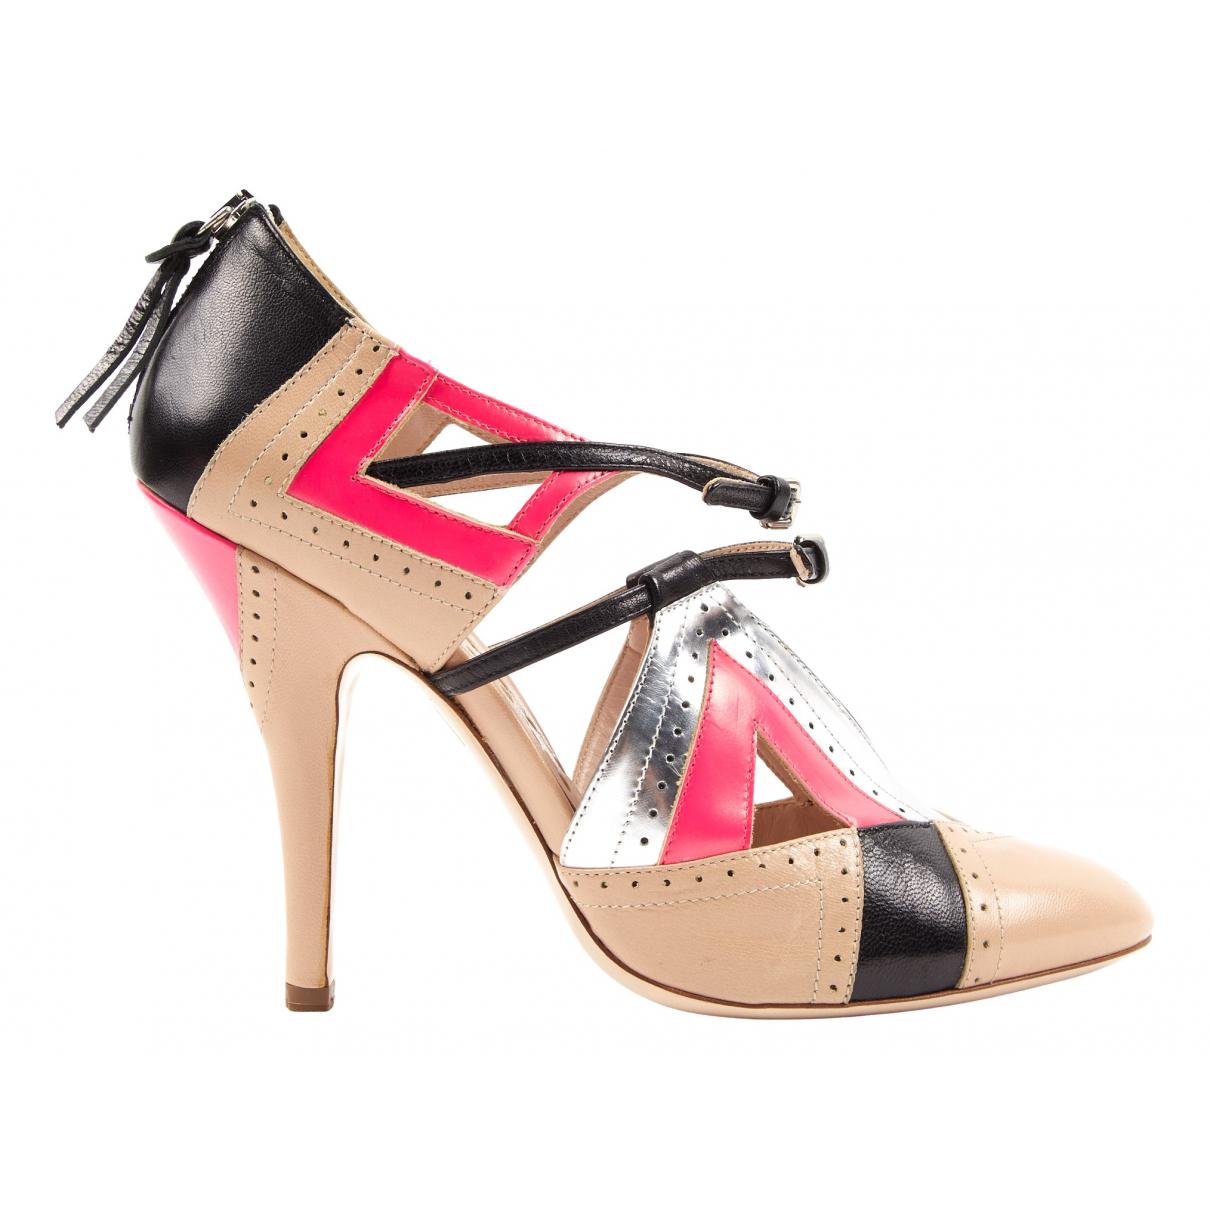 Miu Miu N Multicolour Leather Heels for Women 40 EU